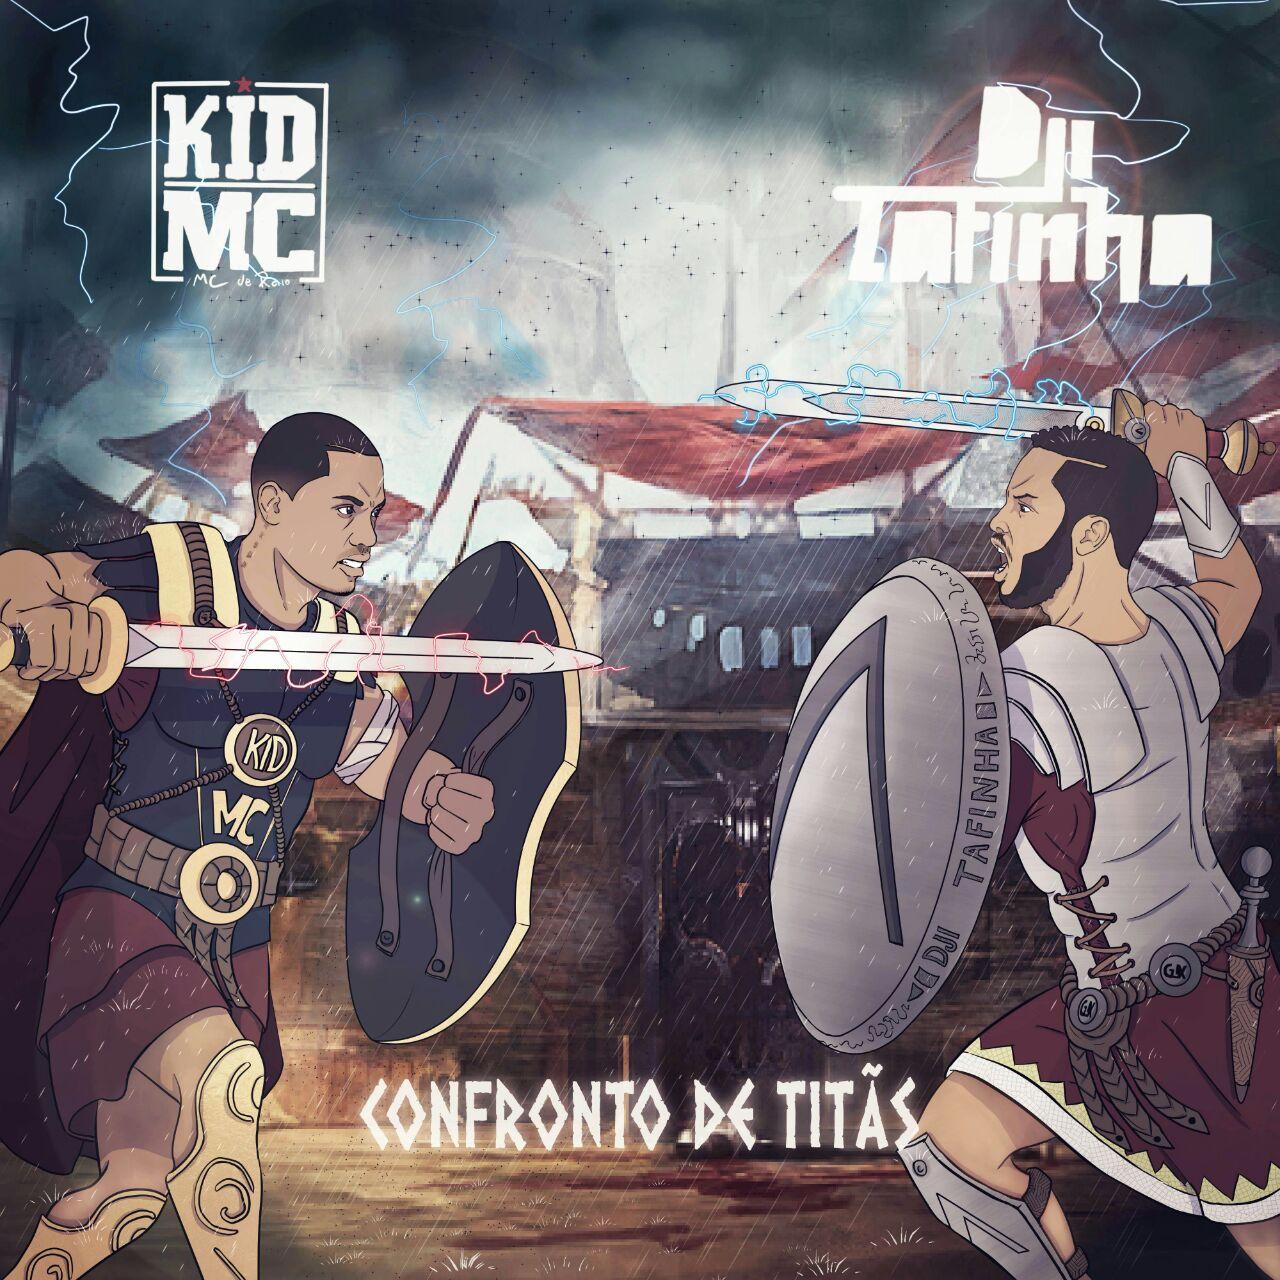 Kid Mc & Dji Tafinha - Confronto de Titãs